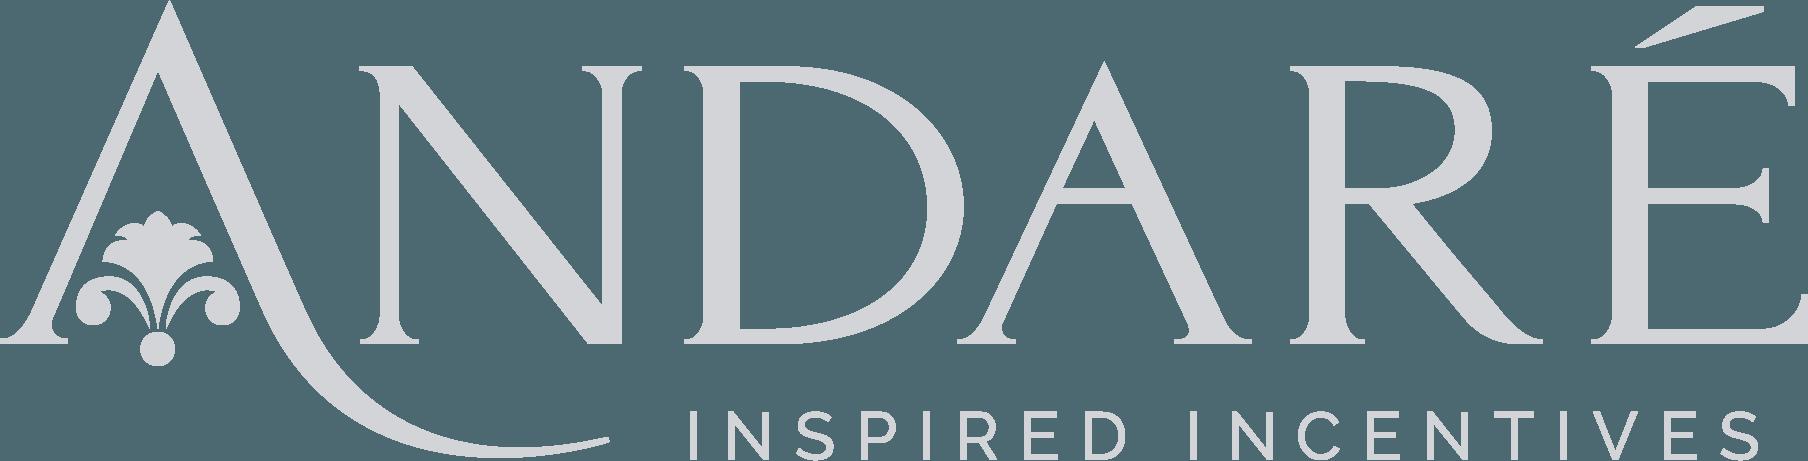 Andaré Inspired Incentives Logo